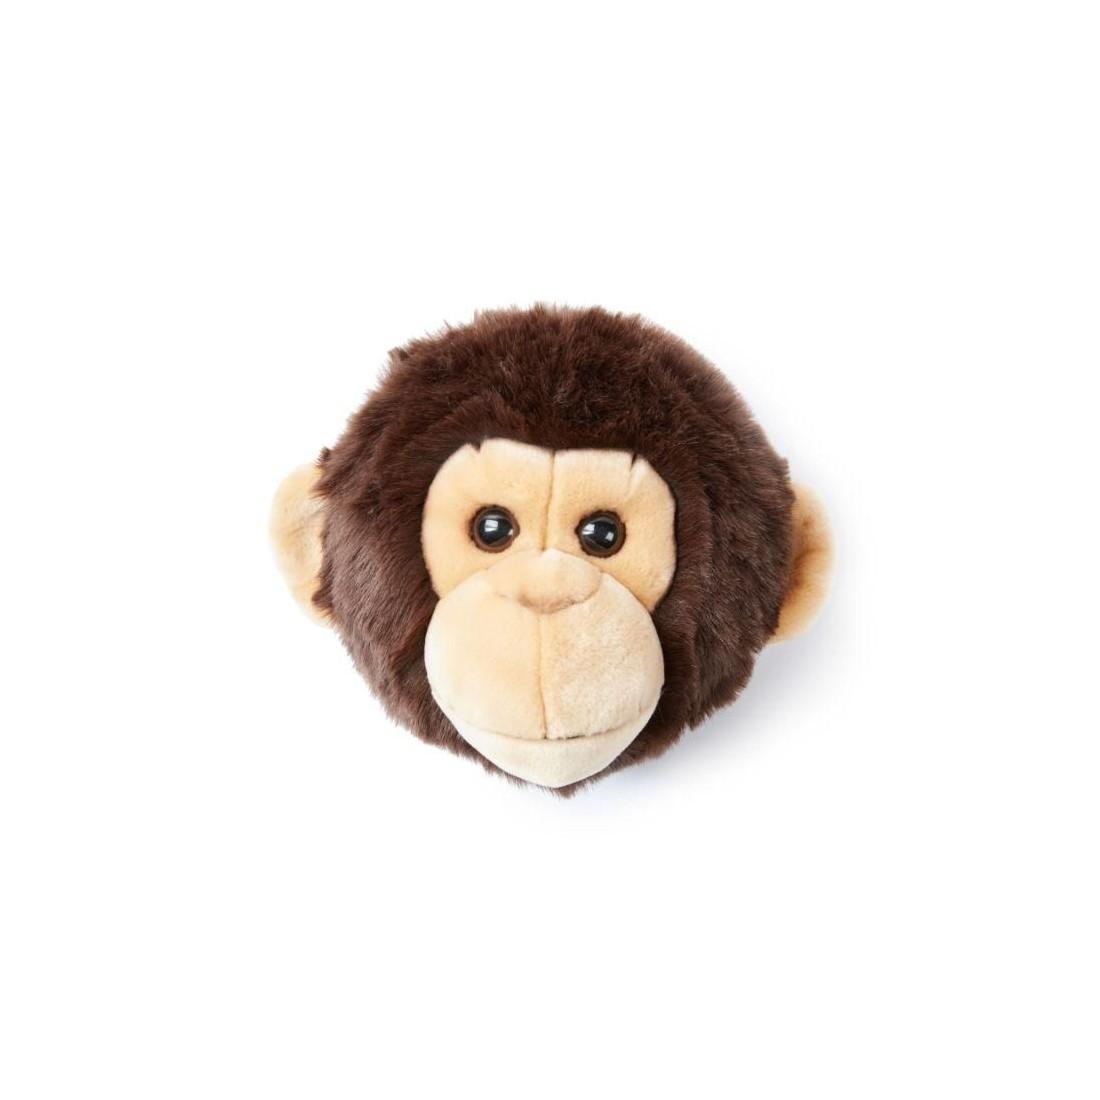 Joe le singe - Wild & Soft